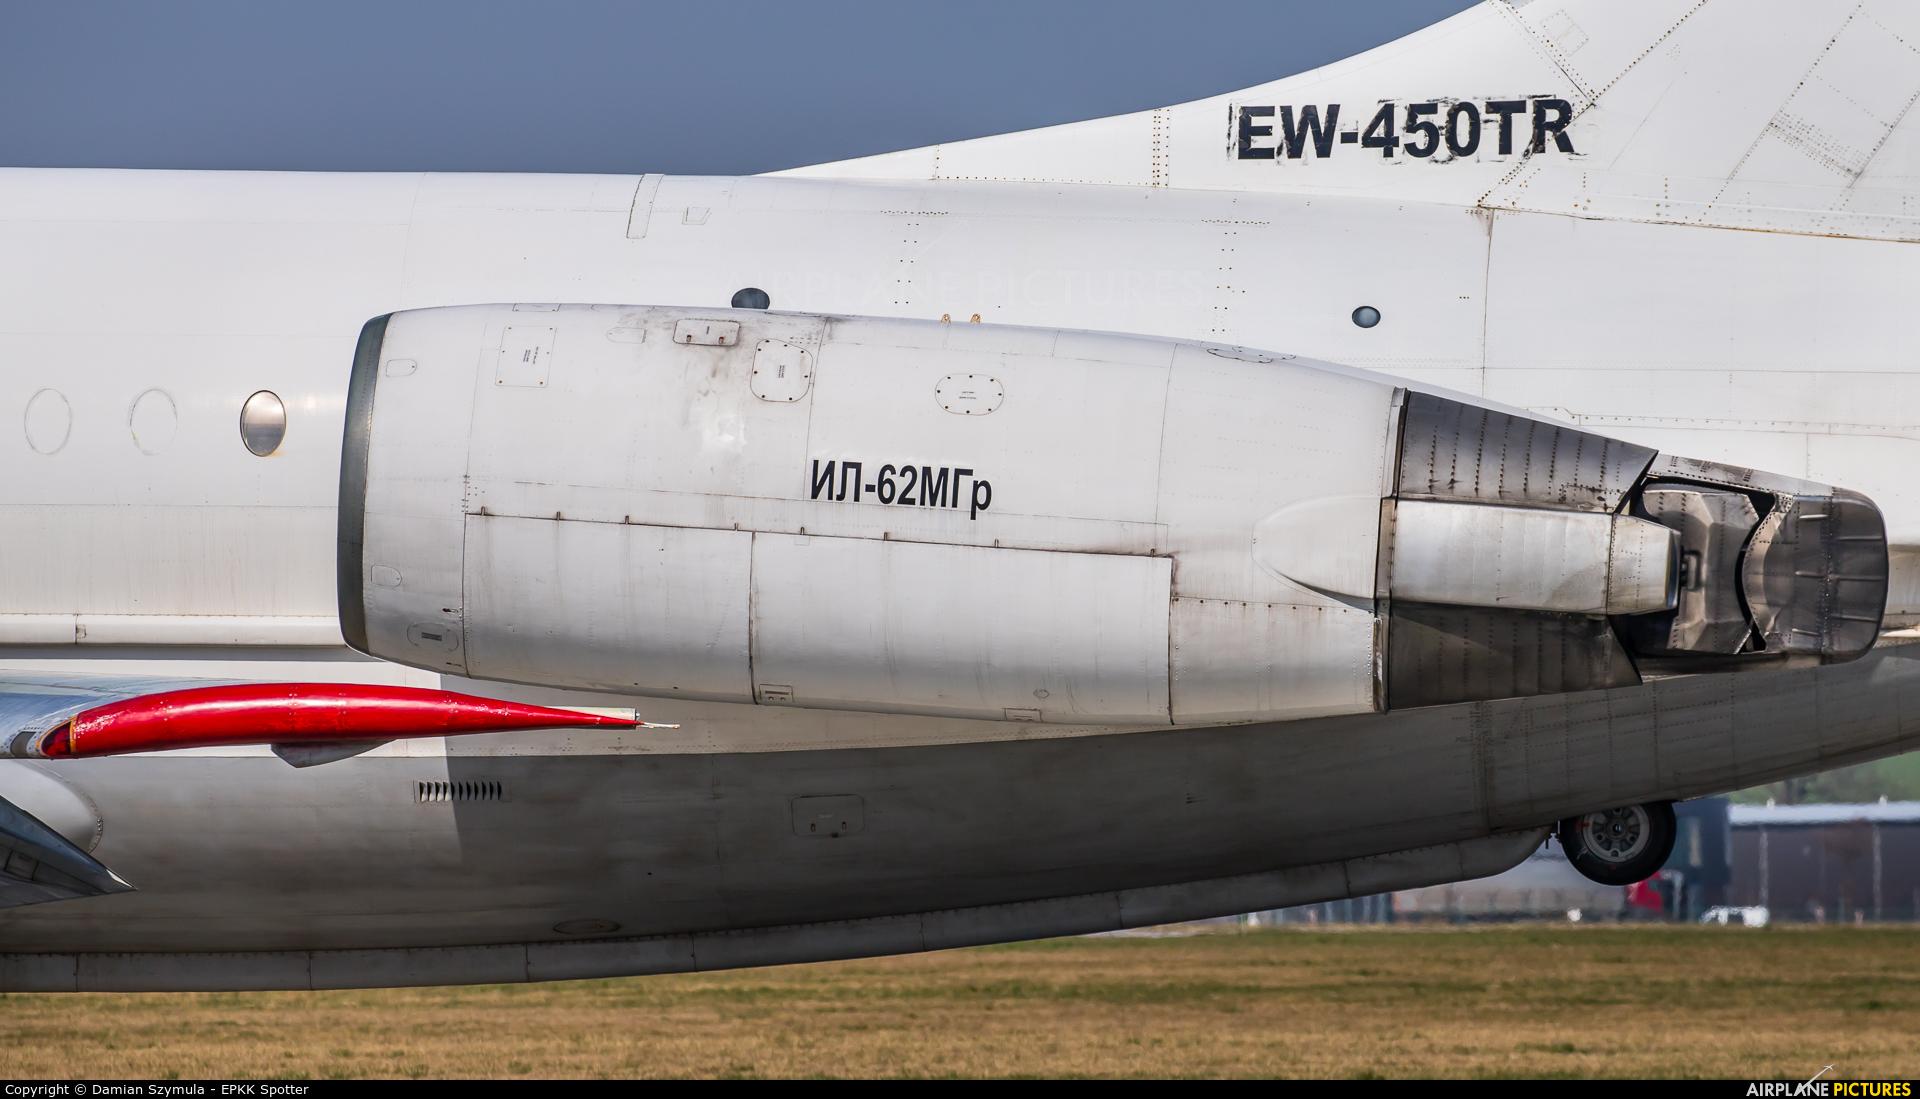 Rada Airlines EW-450TR aircraft at Kraków - John Paul II Intl